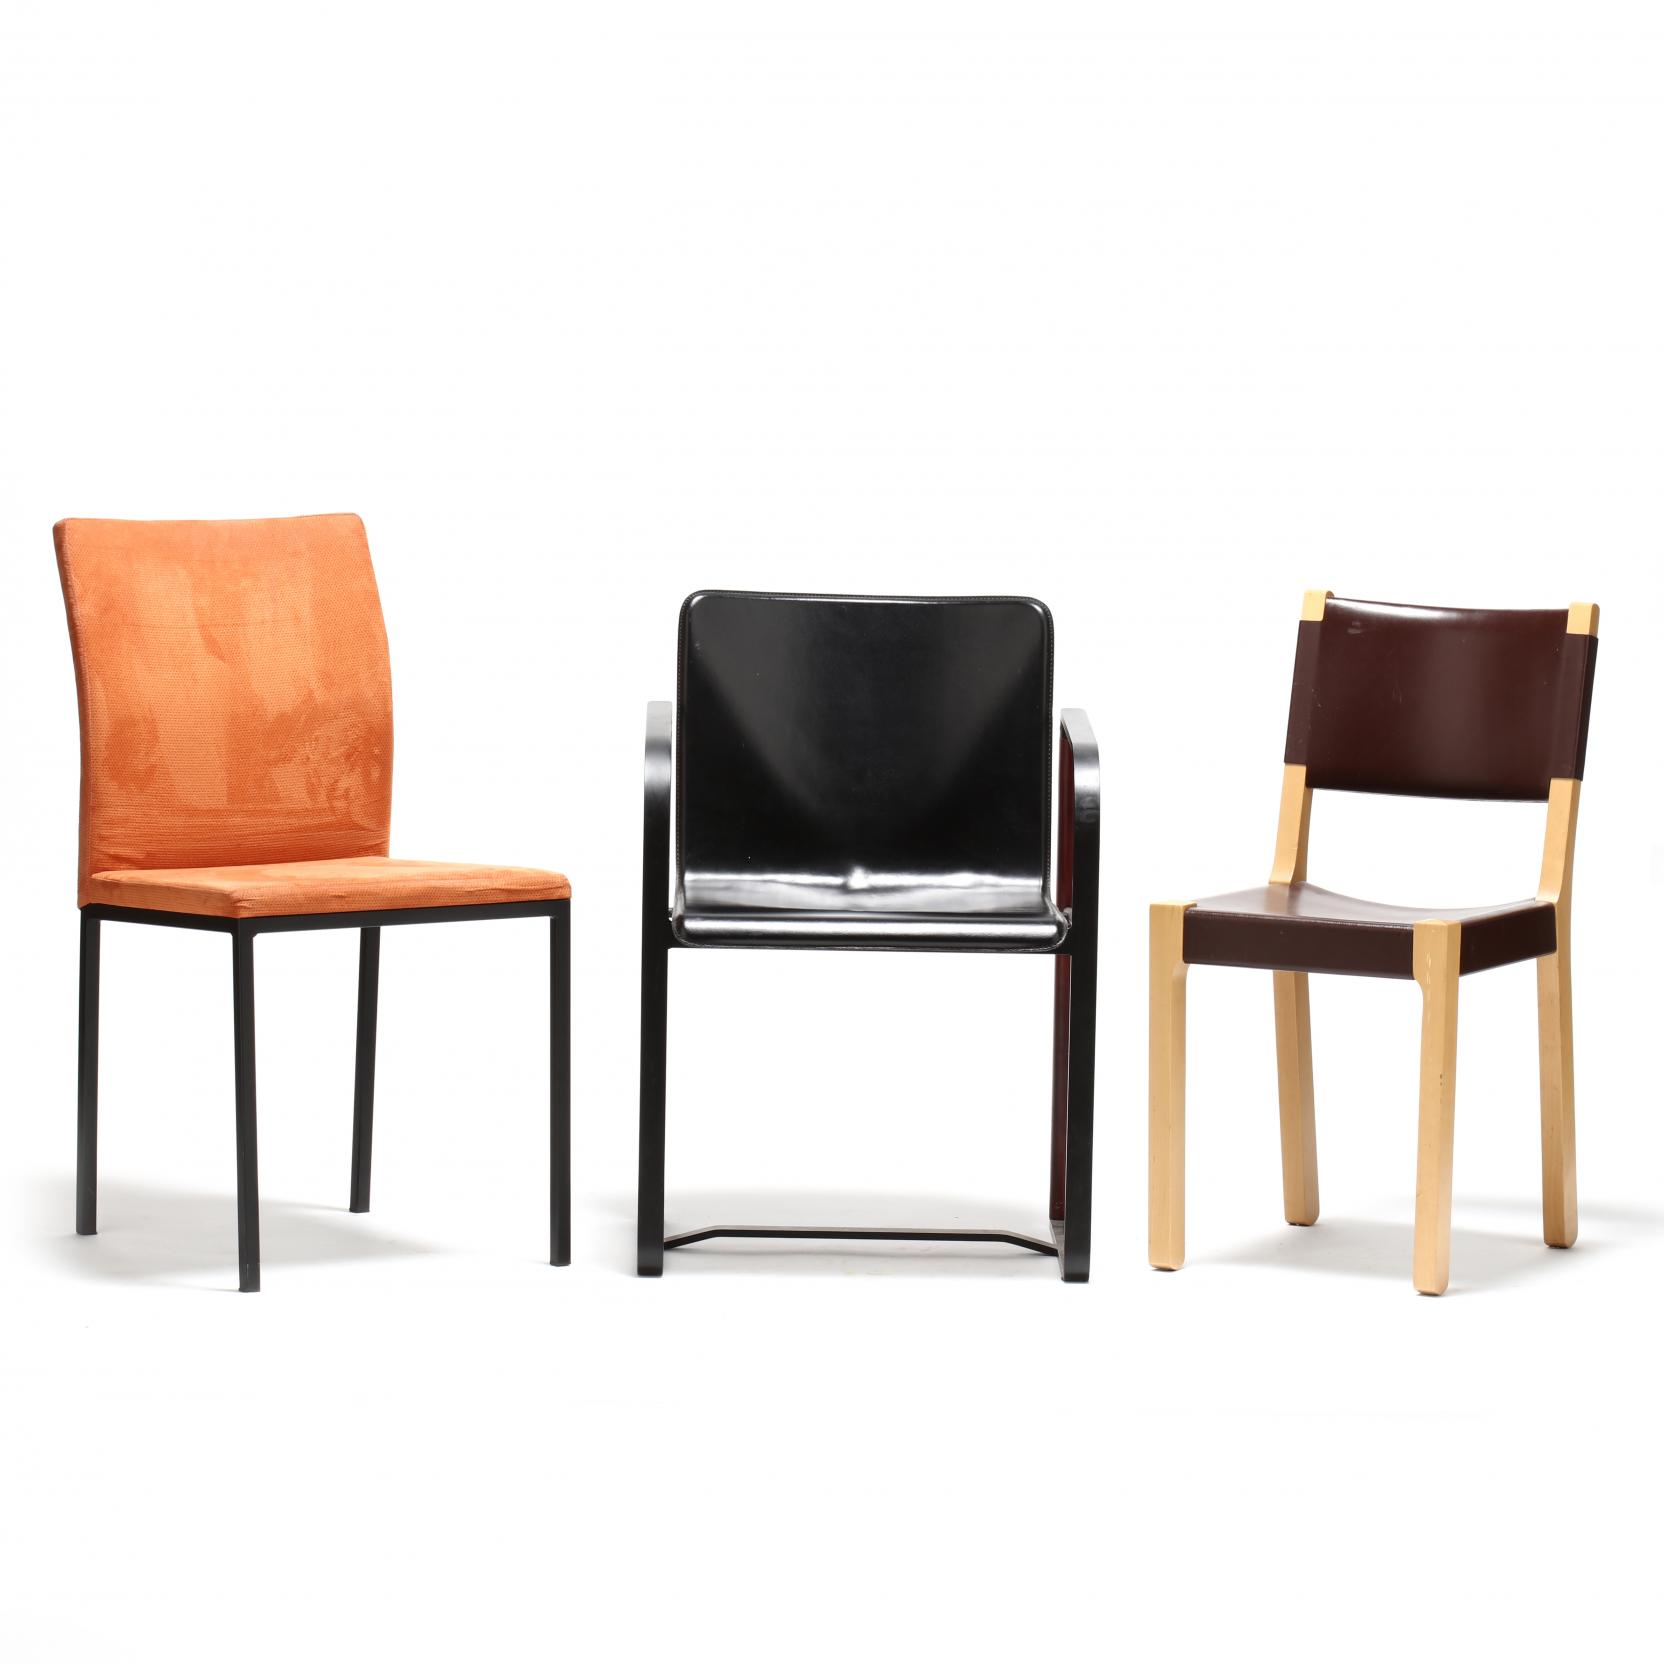 three-italian-modernist-chairs